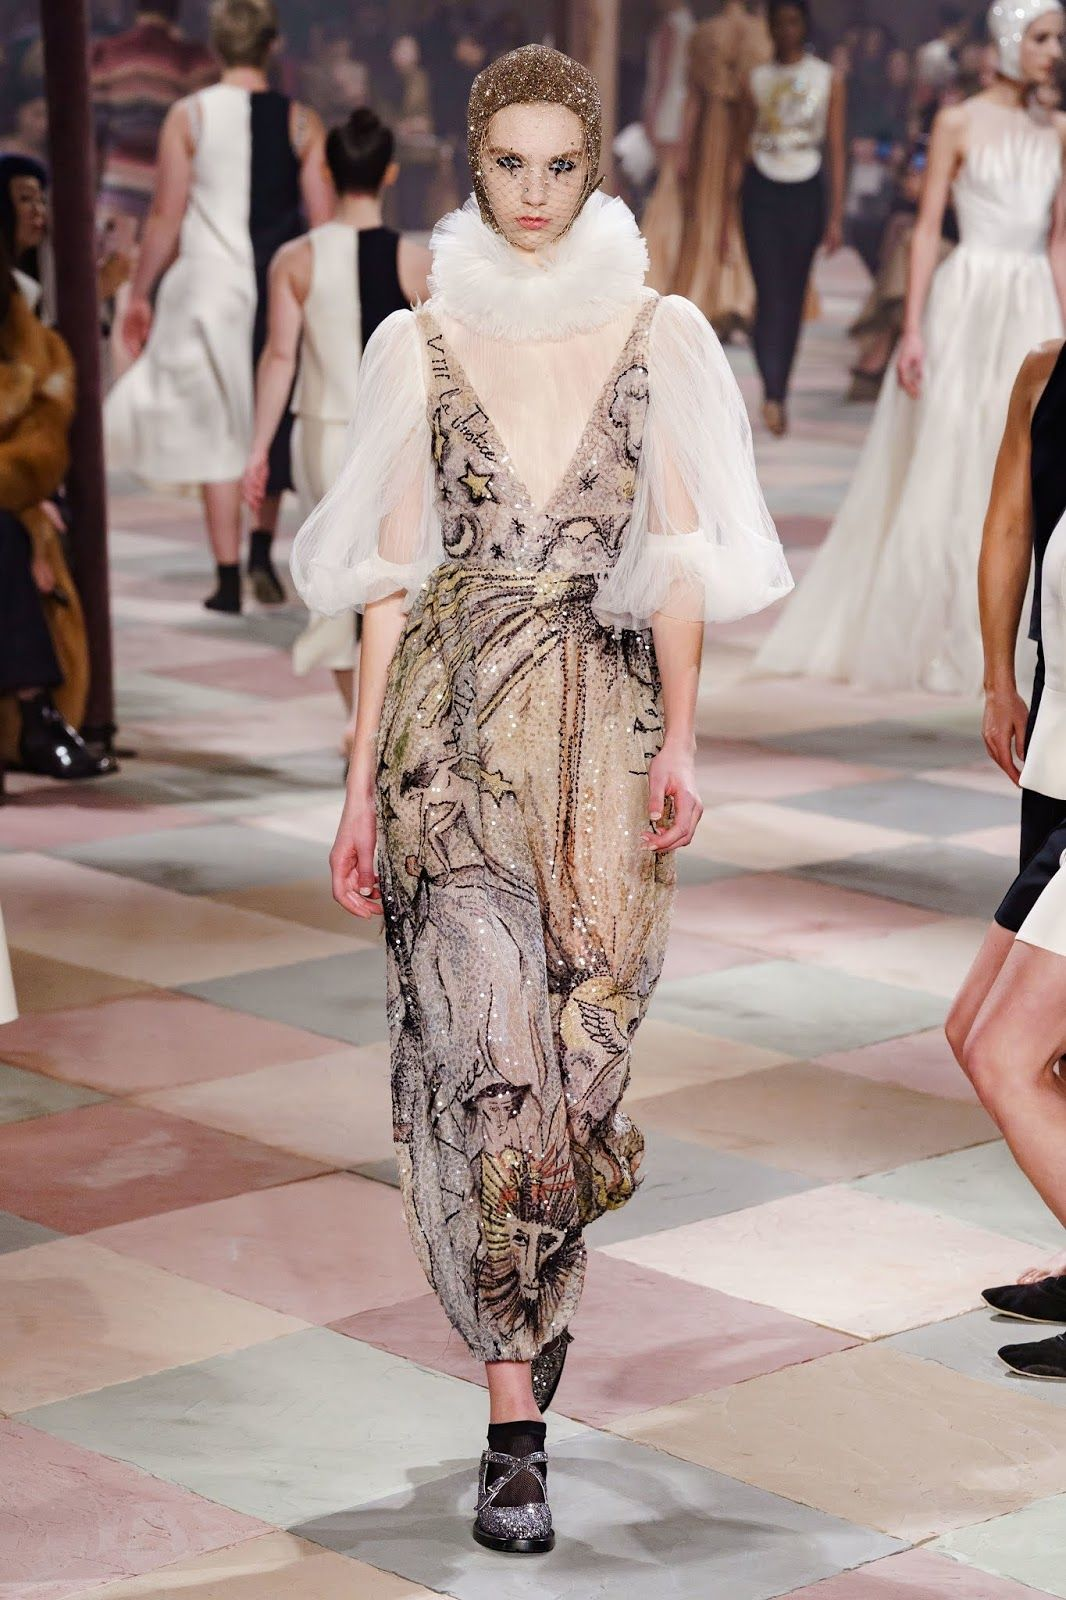 b00dc23562 Haute Couture Glamour: CHRISTIAN DIOR January 21, 2019   ZsaZsa Bellagio -  Like No